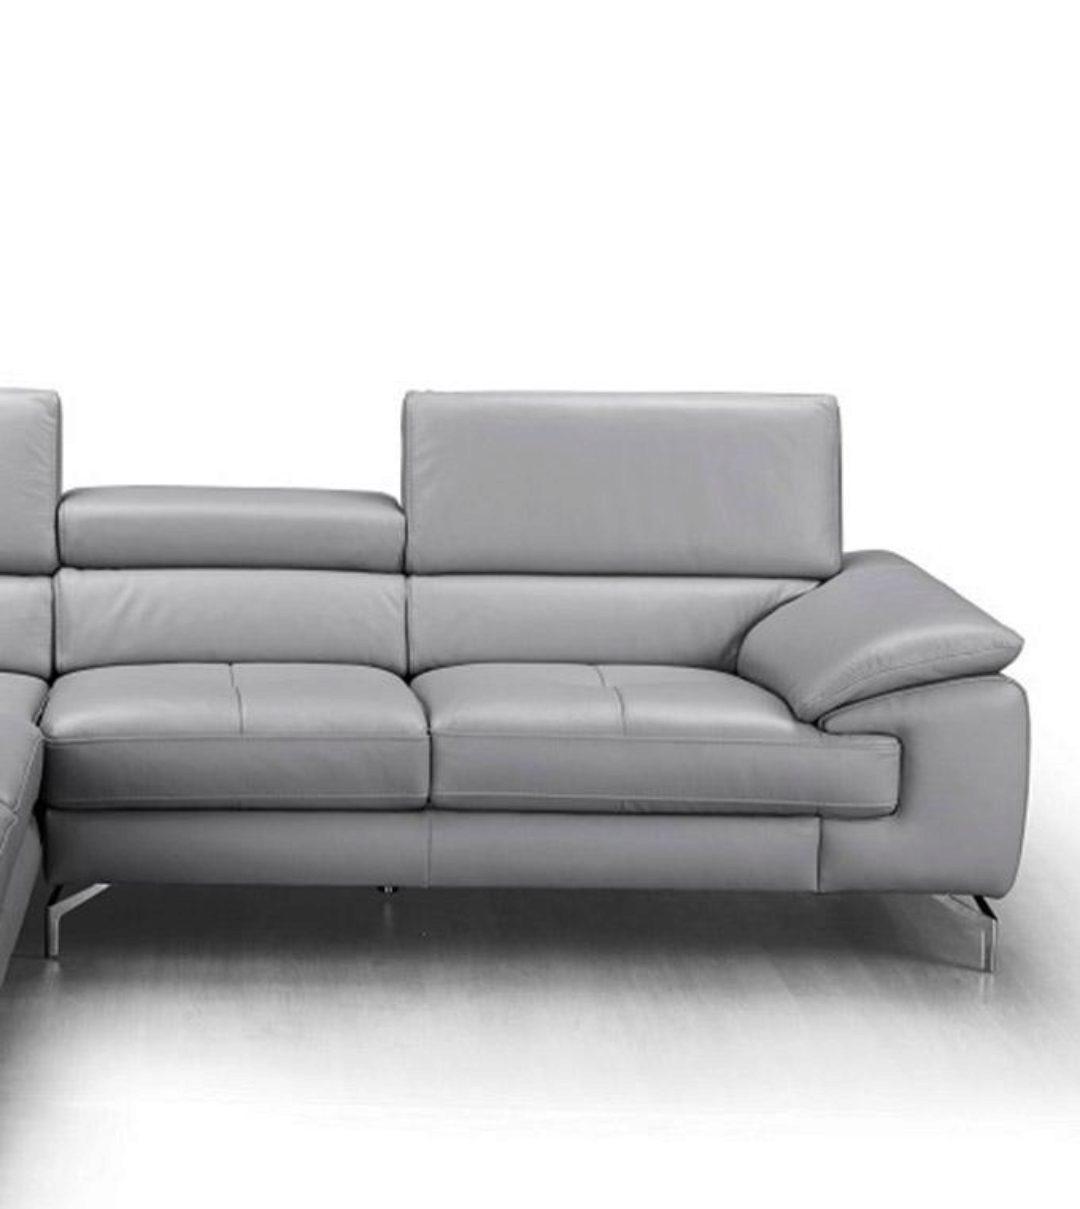 Grey Premium Italian Leather Sectional Sofa Lhc Modern J M Olivia Sku18275 Sectional Lhc